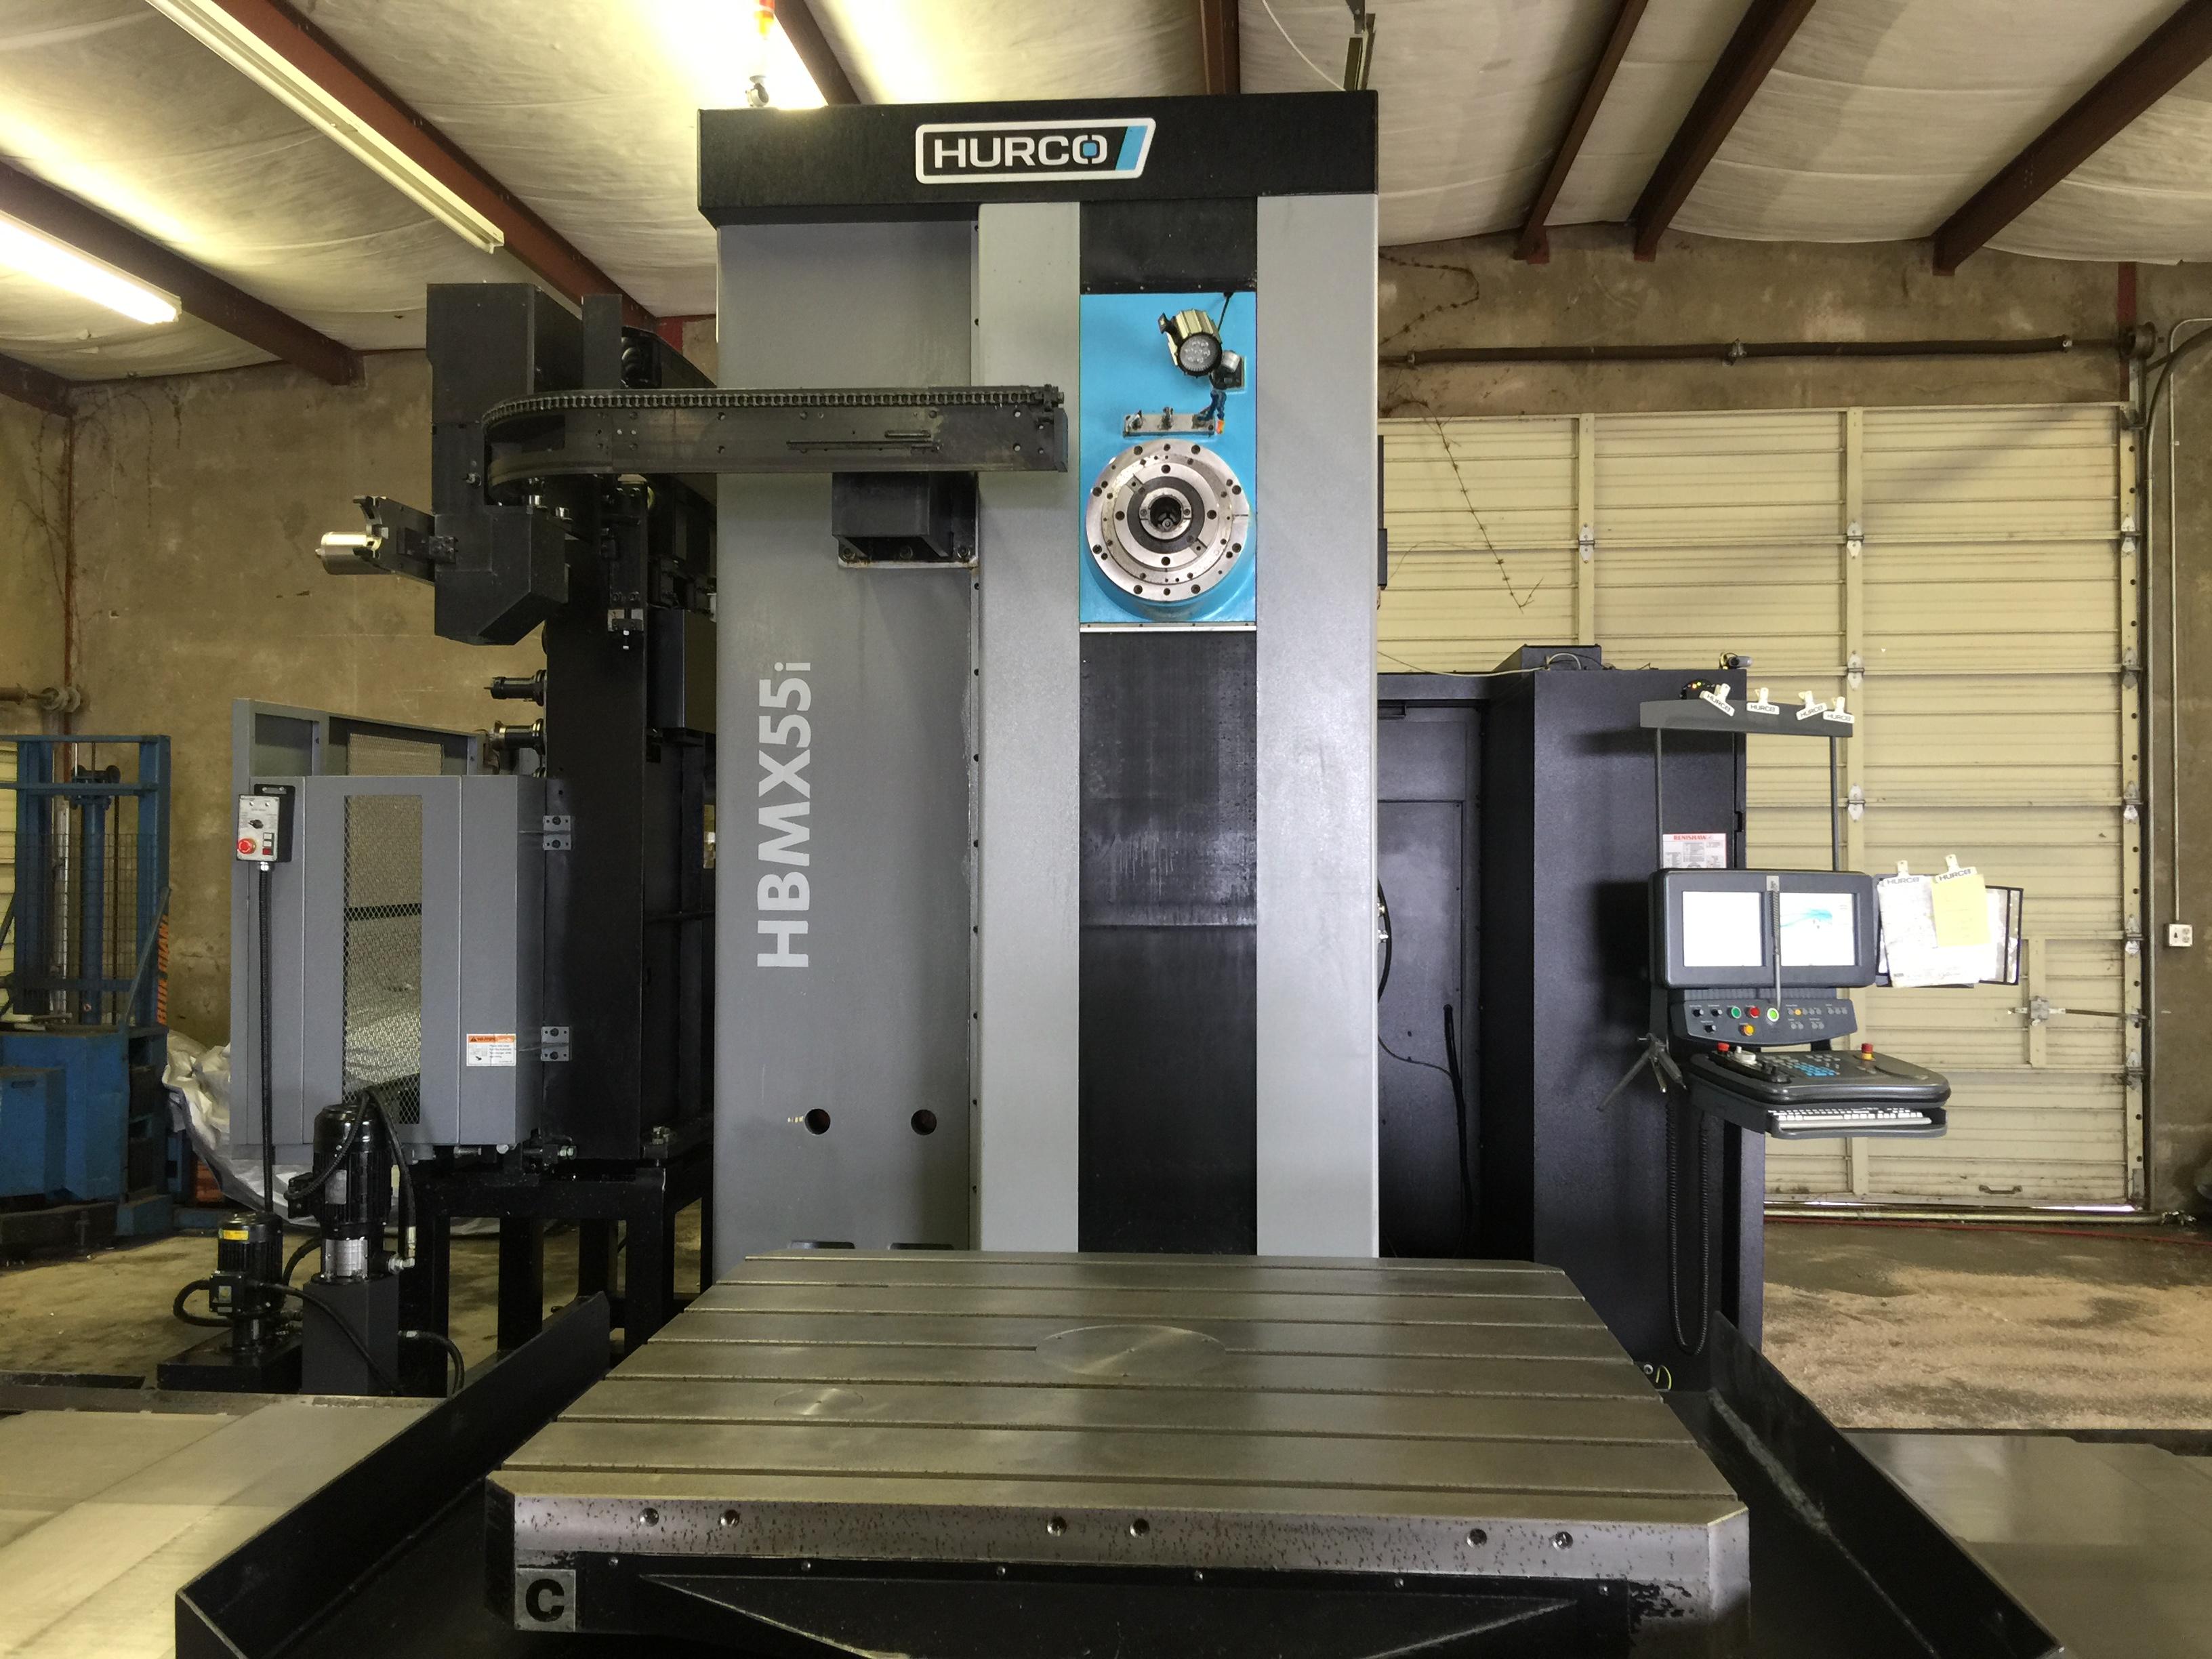 Used Hurco Horizontal Boring Mill HBMX55i For Sale